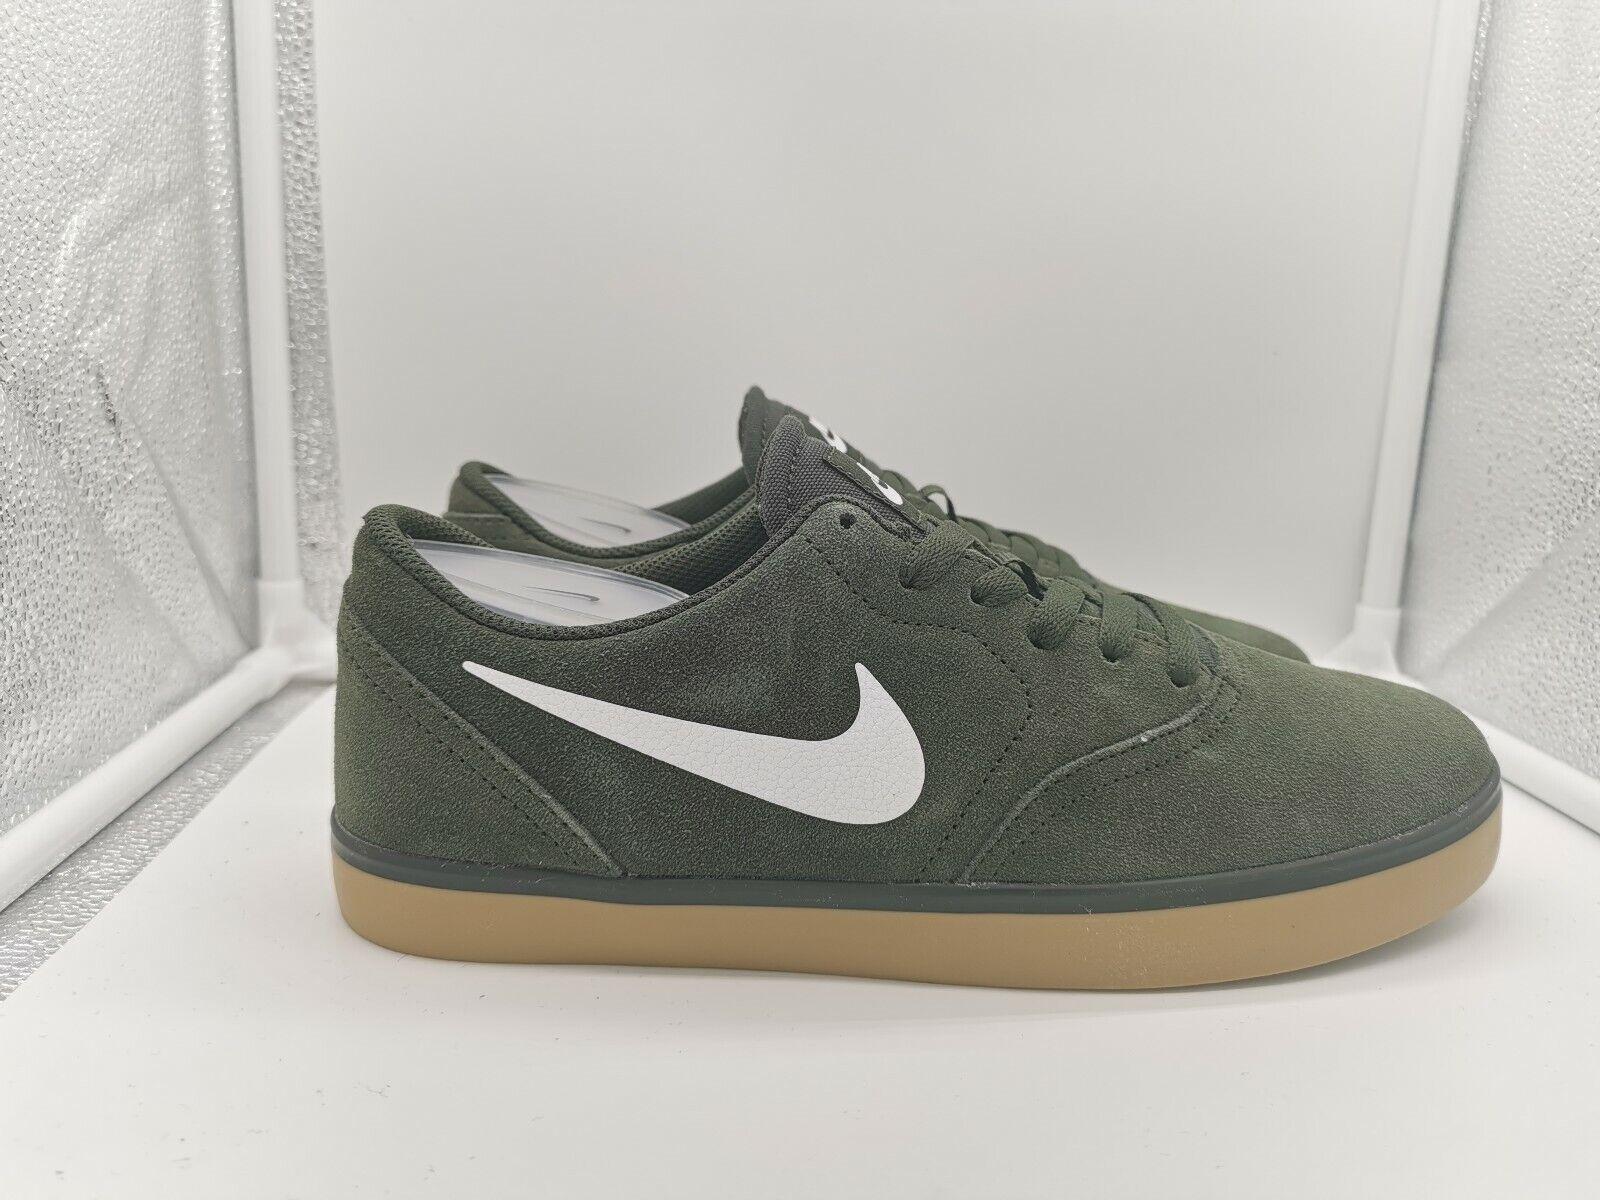 Nike SB Check UK 8 Sequoia Weiß Gum Light braun 705265-312